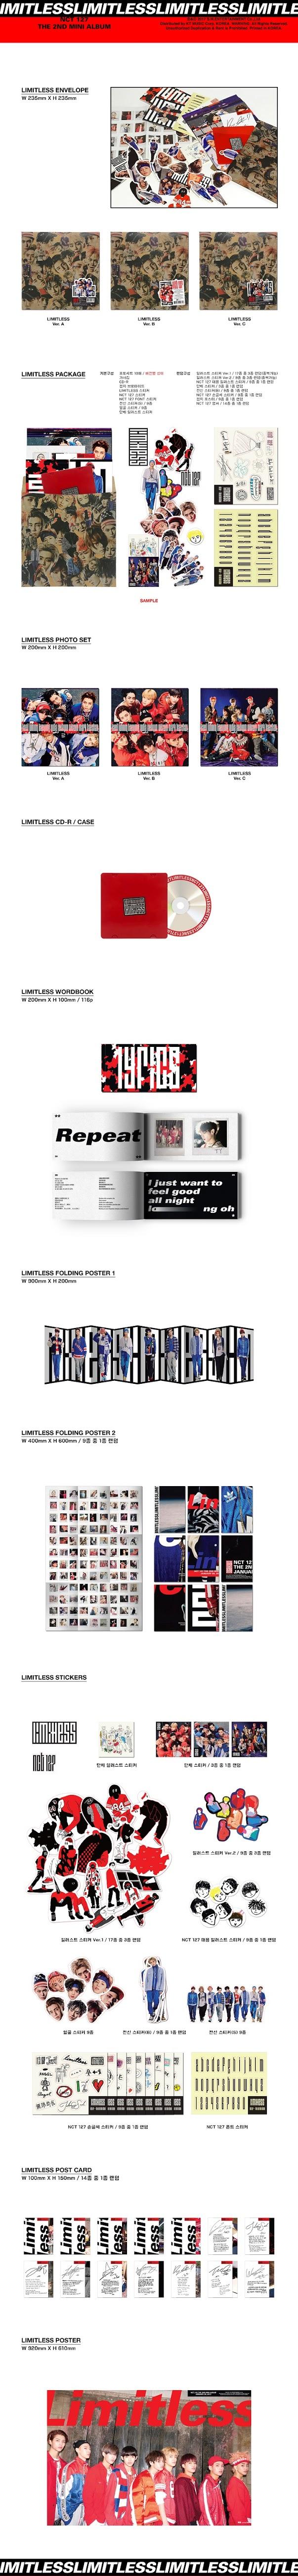 NCT 127 Mini Album Vol  2 - NCT #127 Limitless : Valoa Records